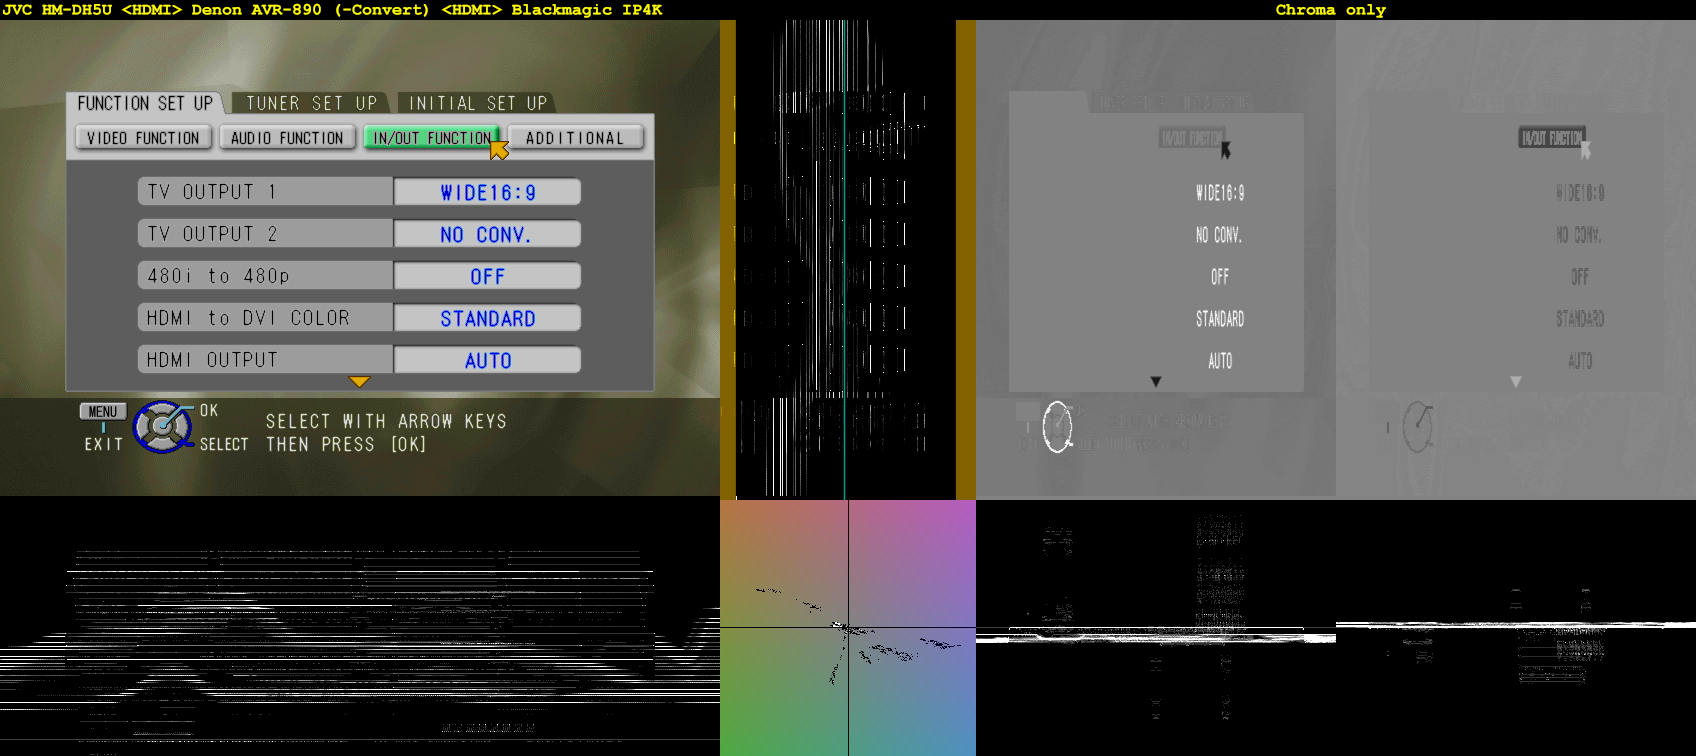 Click image for larger version  Name:Menu - JVC HM-DH5U =HDMI= Denon AVR-890, -Convert =HDMI= IP4K.png Views:3222 Size:396.0 KB ID:35274